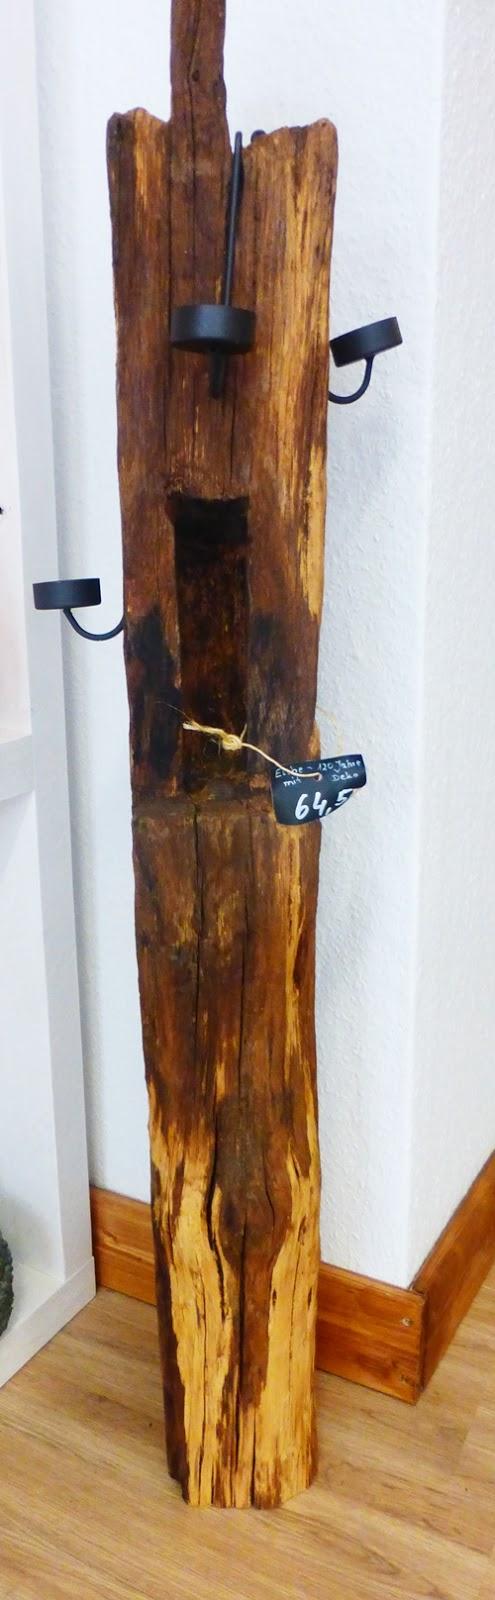 Kunsthandwerk Hunsrück Laterne Eichenholz